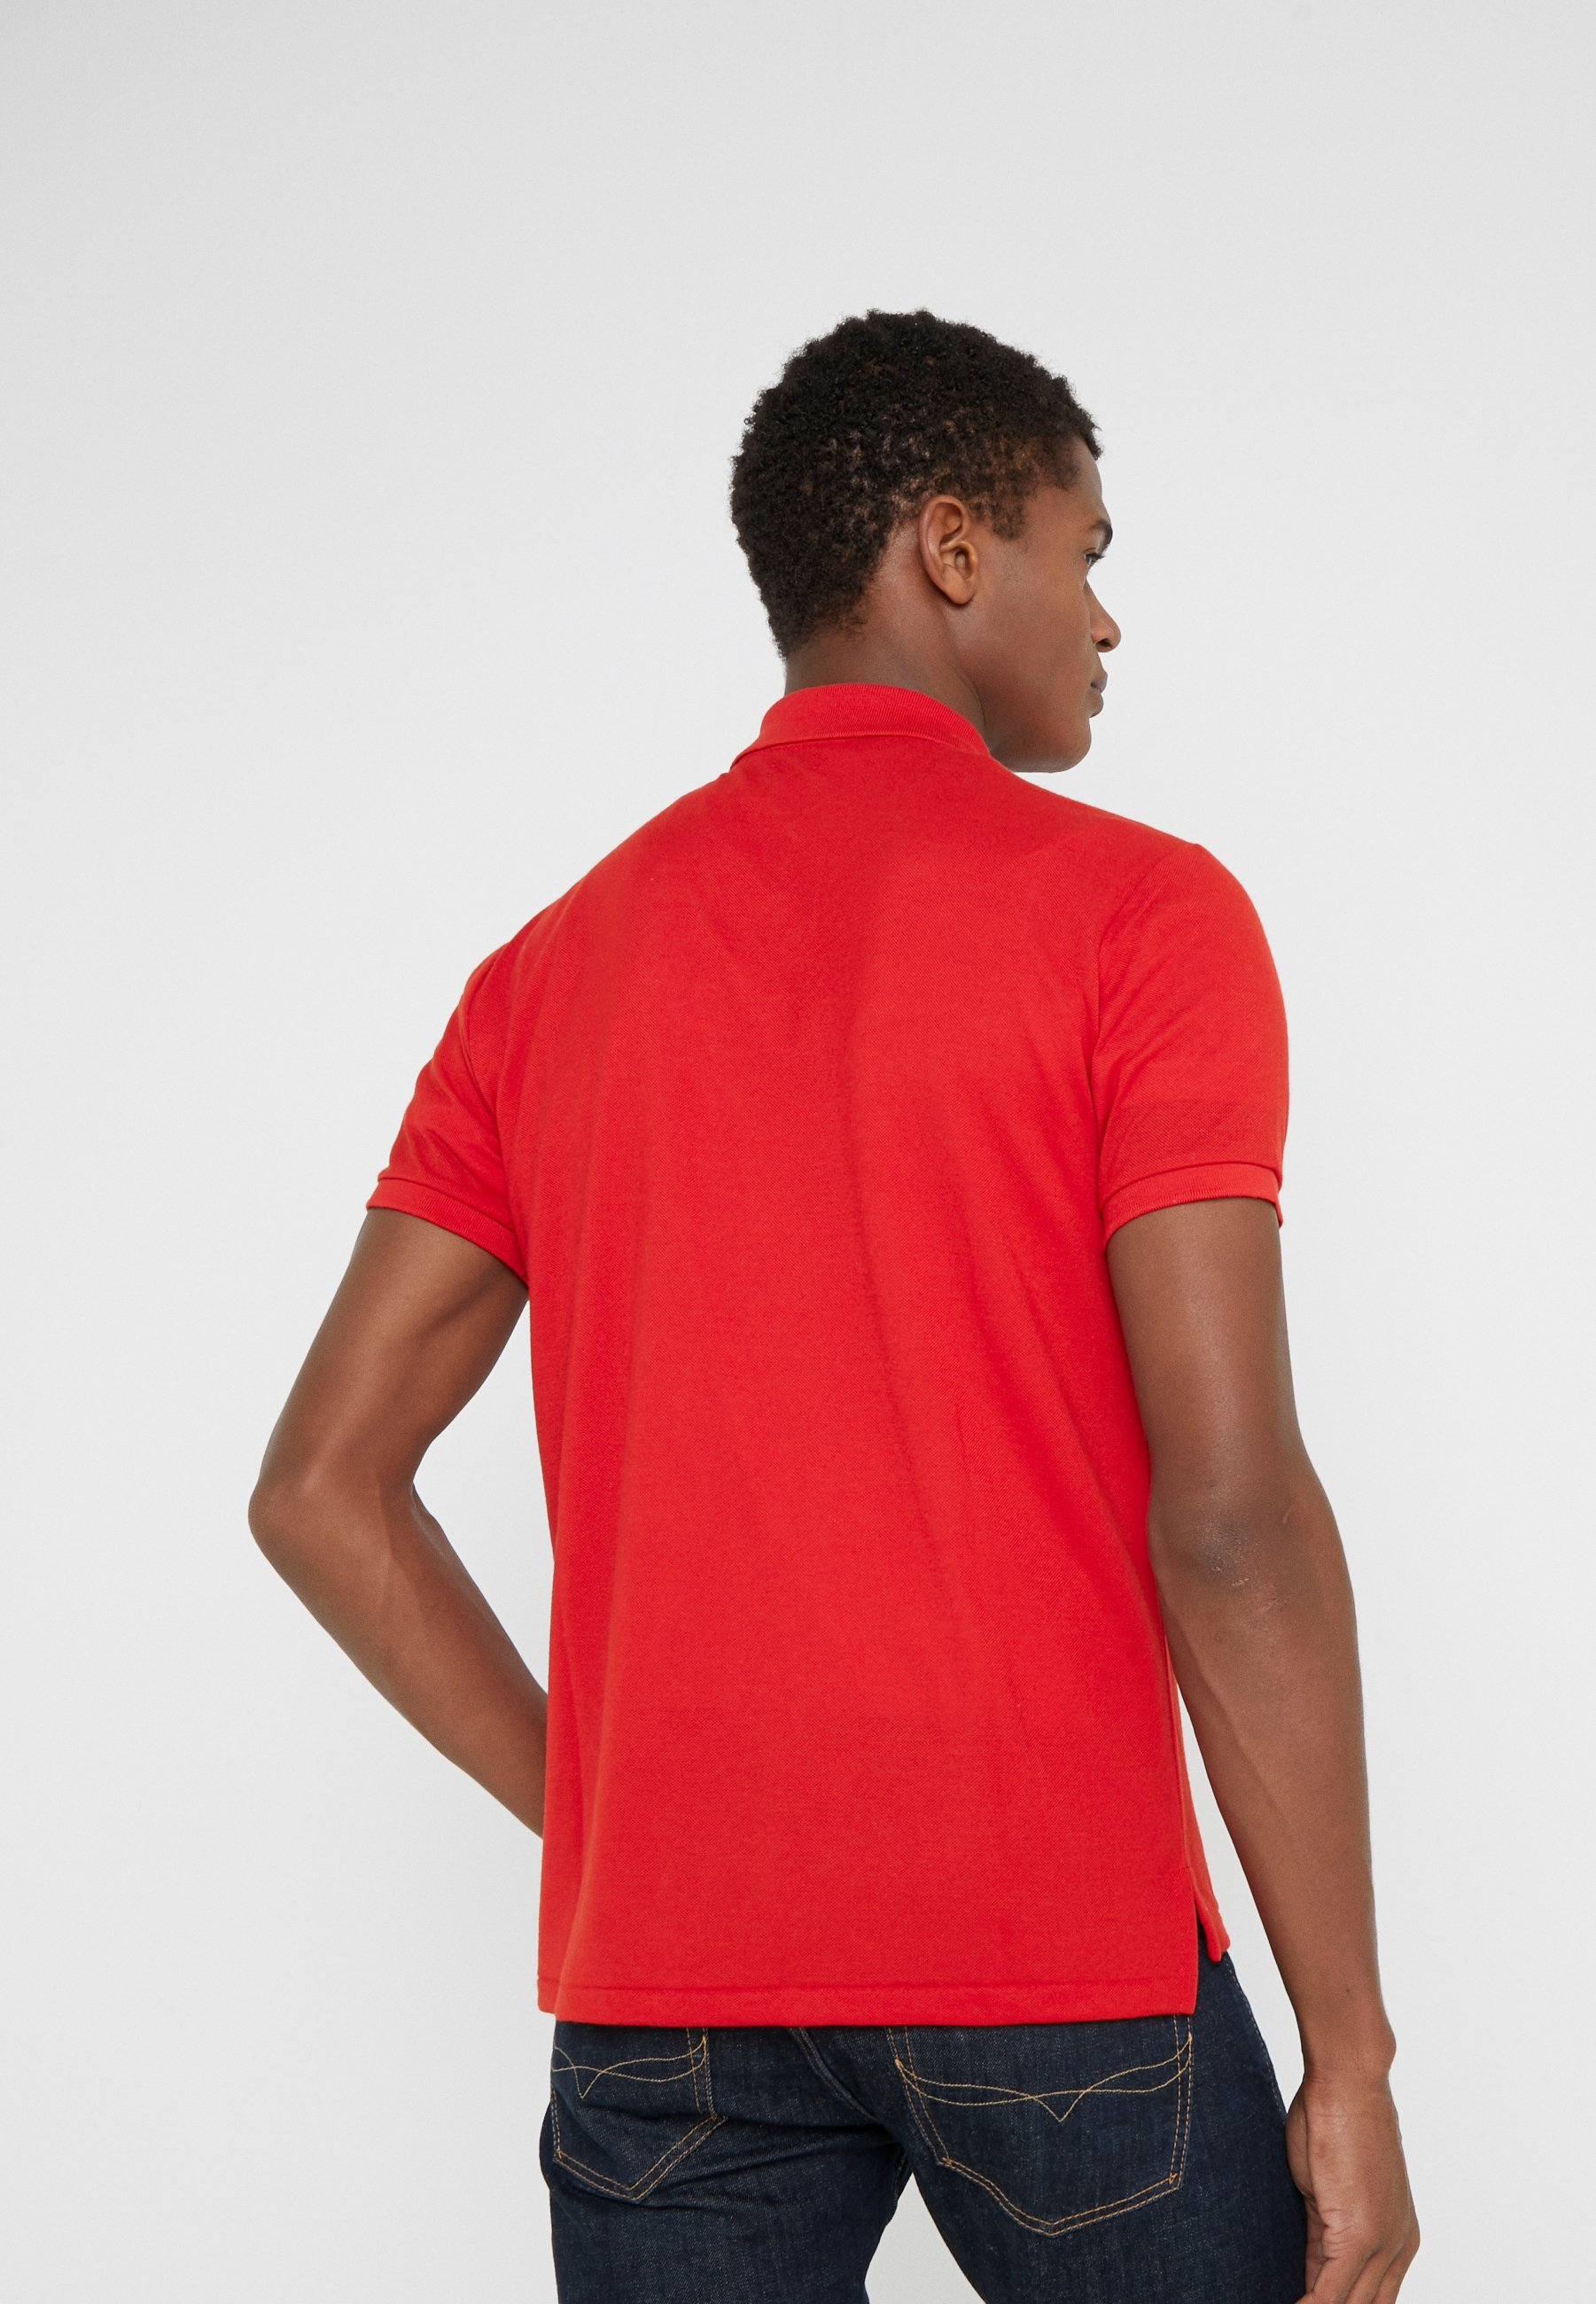 Polo Ralph Lauren SLIM FIT - Koszulka polo - red